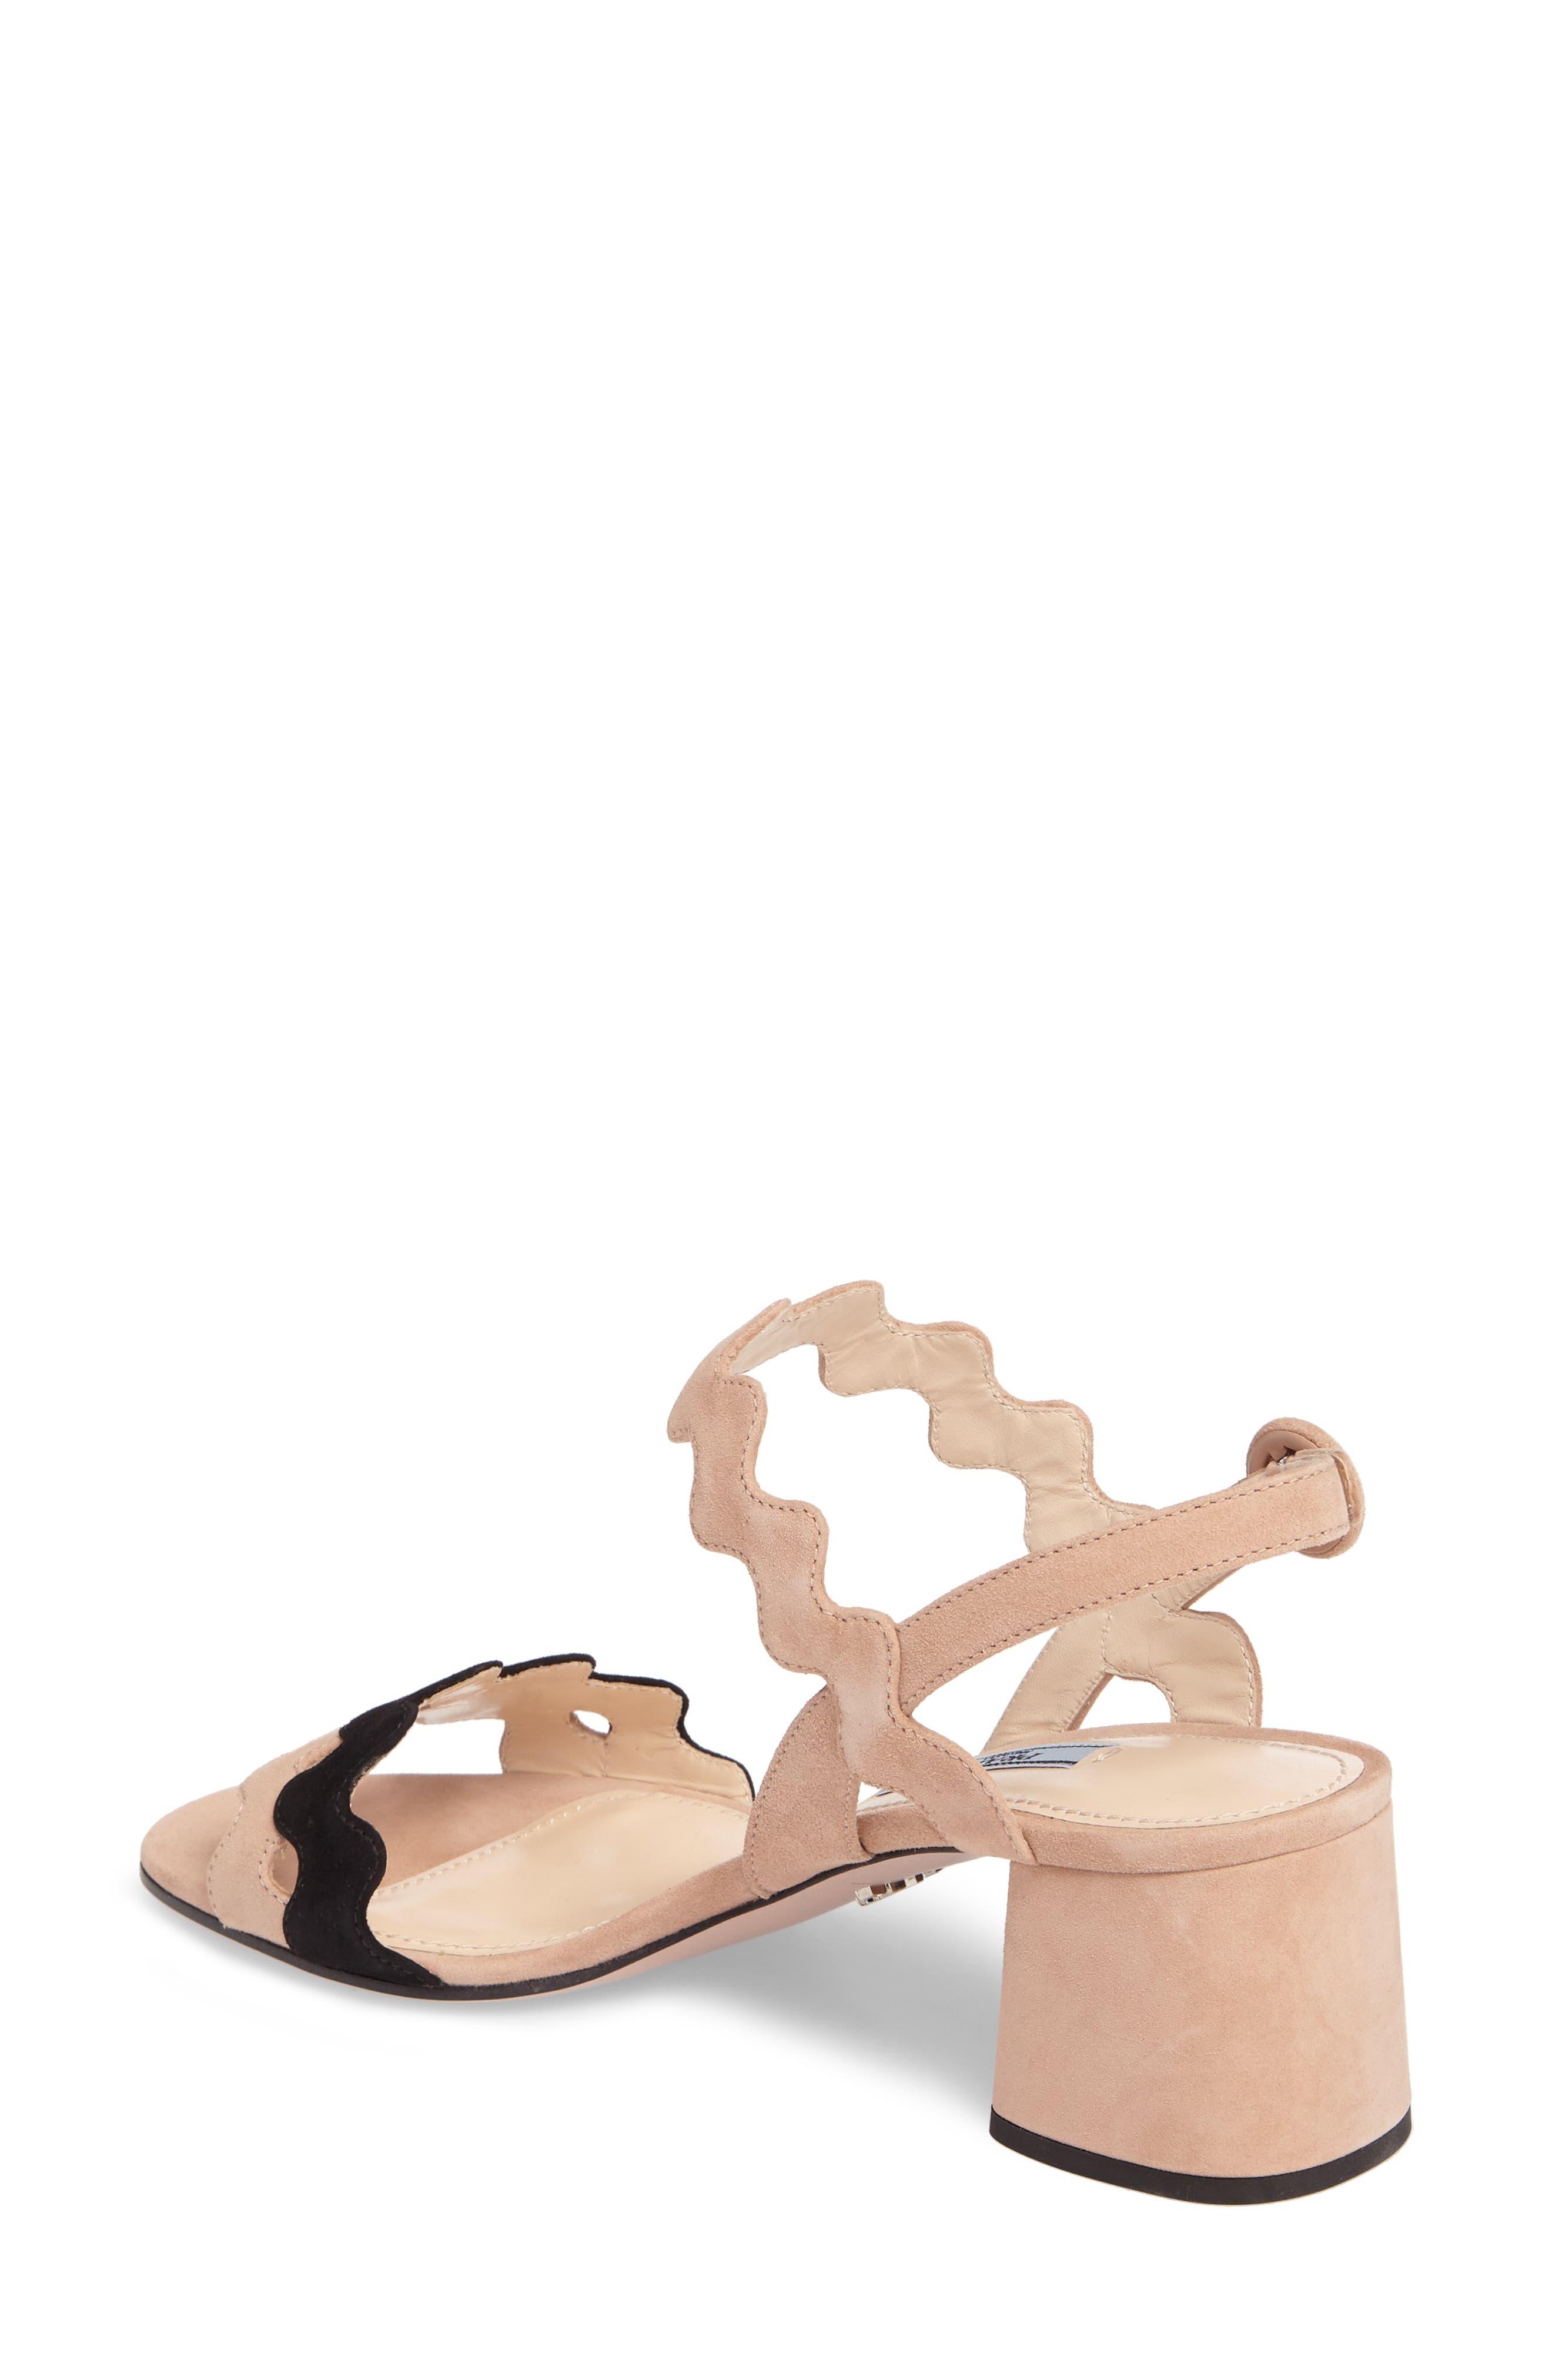 Double Strap Wave Sandal,                             Alternate thumbnail 2, color,                             Nude